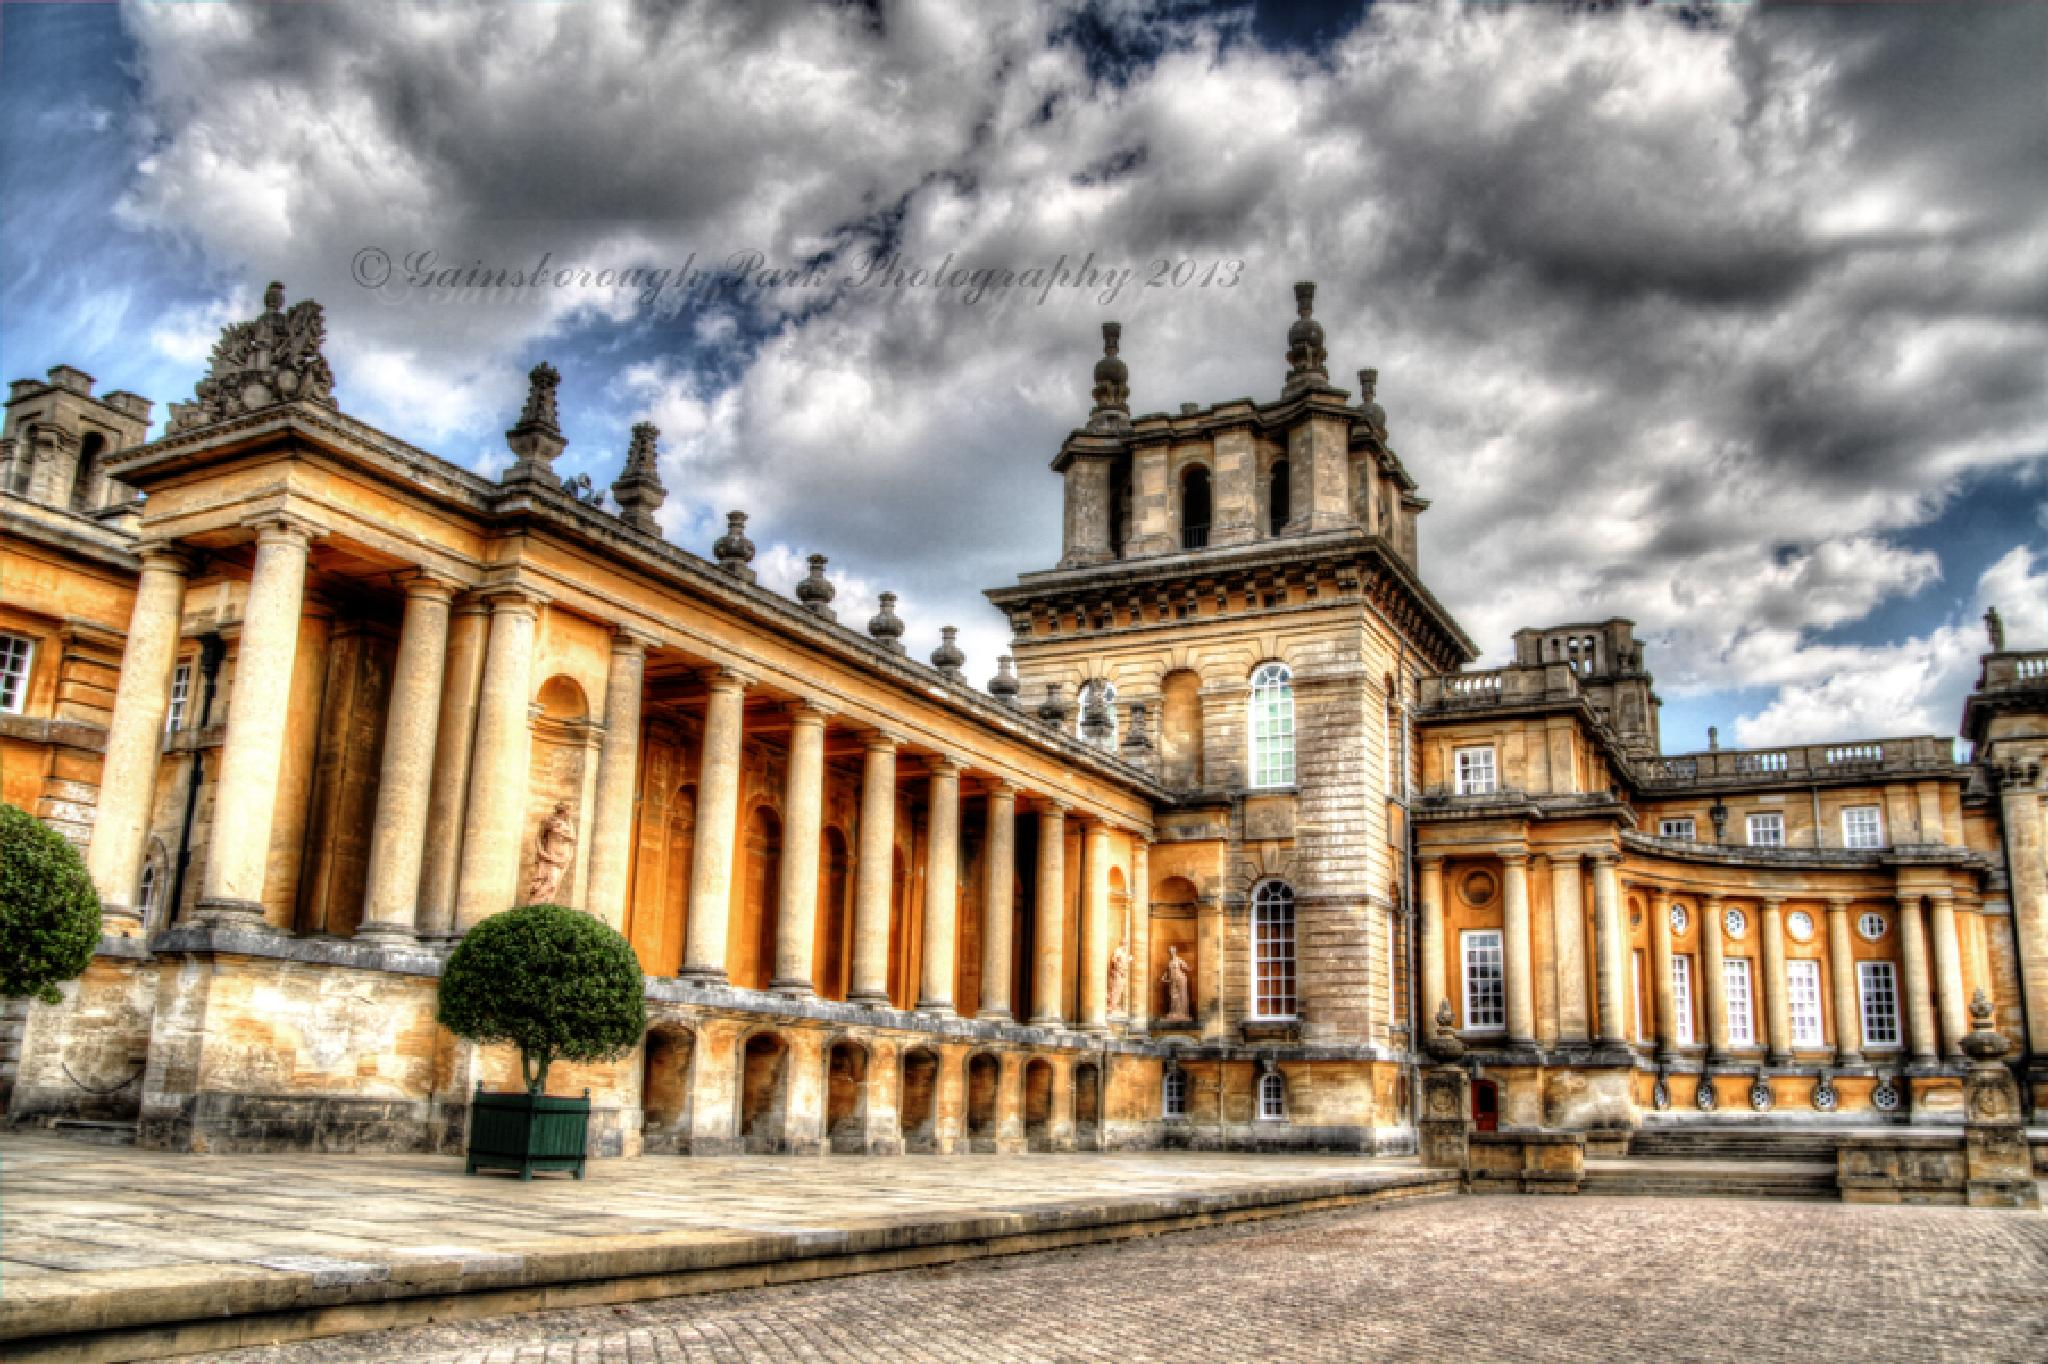 Blenheim Palace by Gainsborough Park Photography